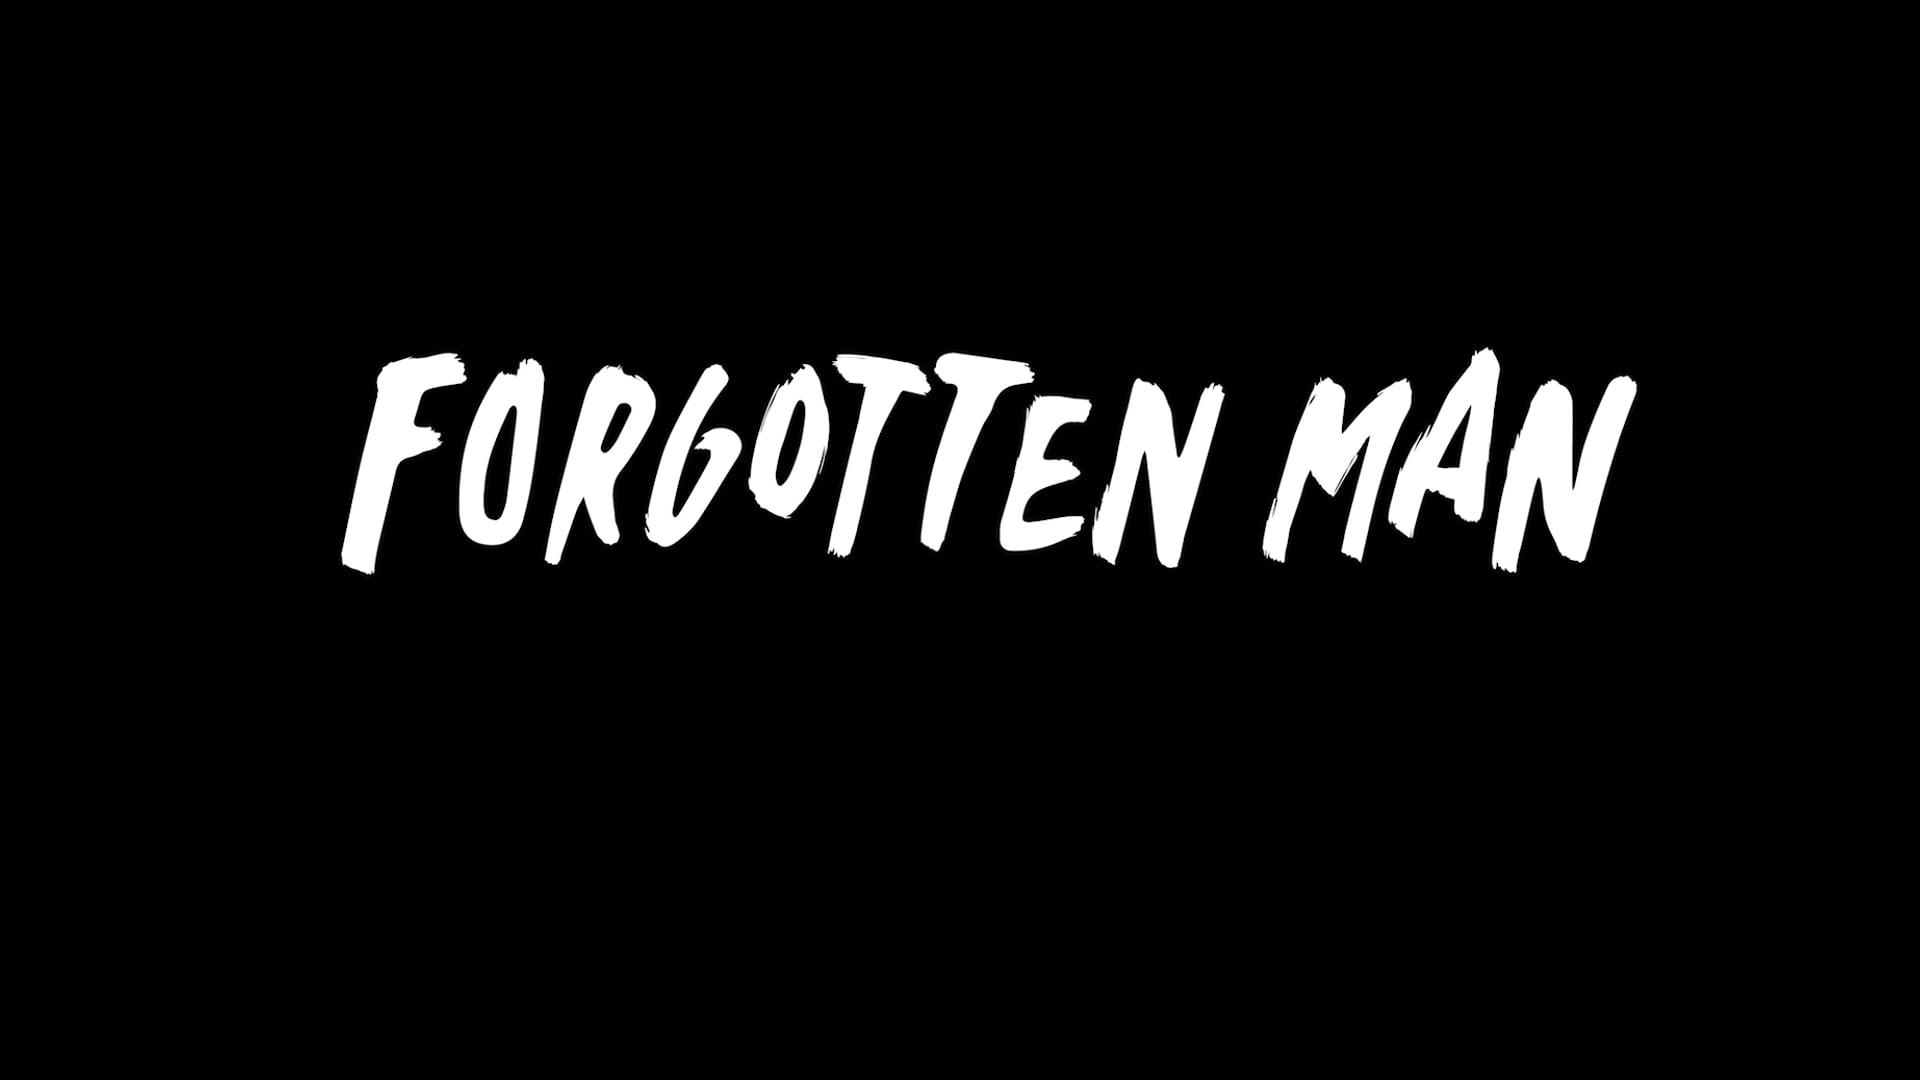 Forgotten Man Trailer